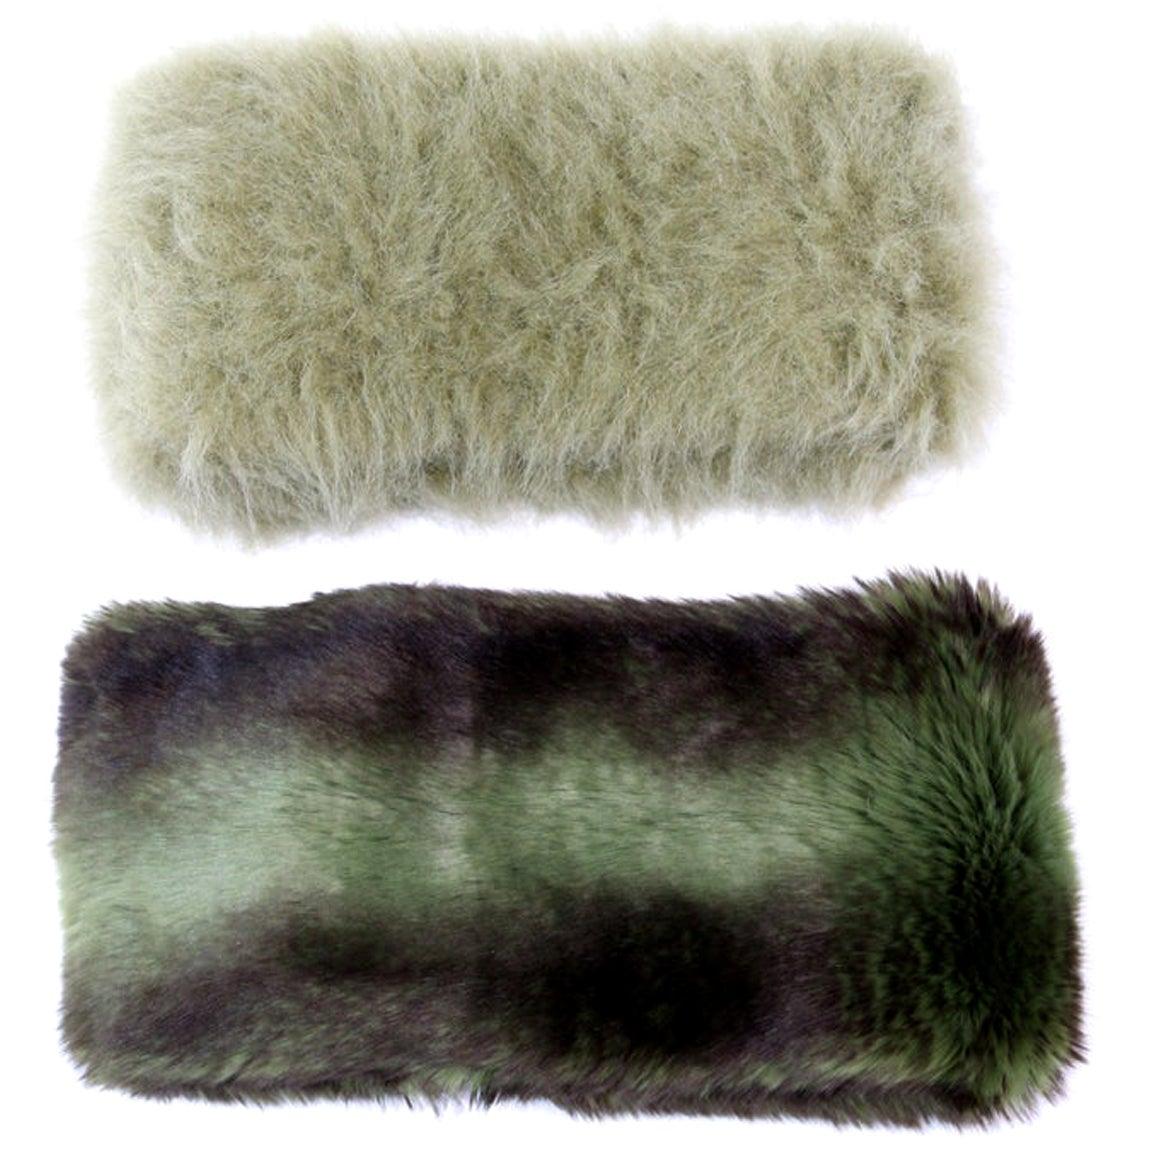 Pelush Faux Fur Scarfs set - Fake Fur Green Chinchilla Neck Warmer/Hats One size